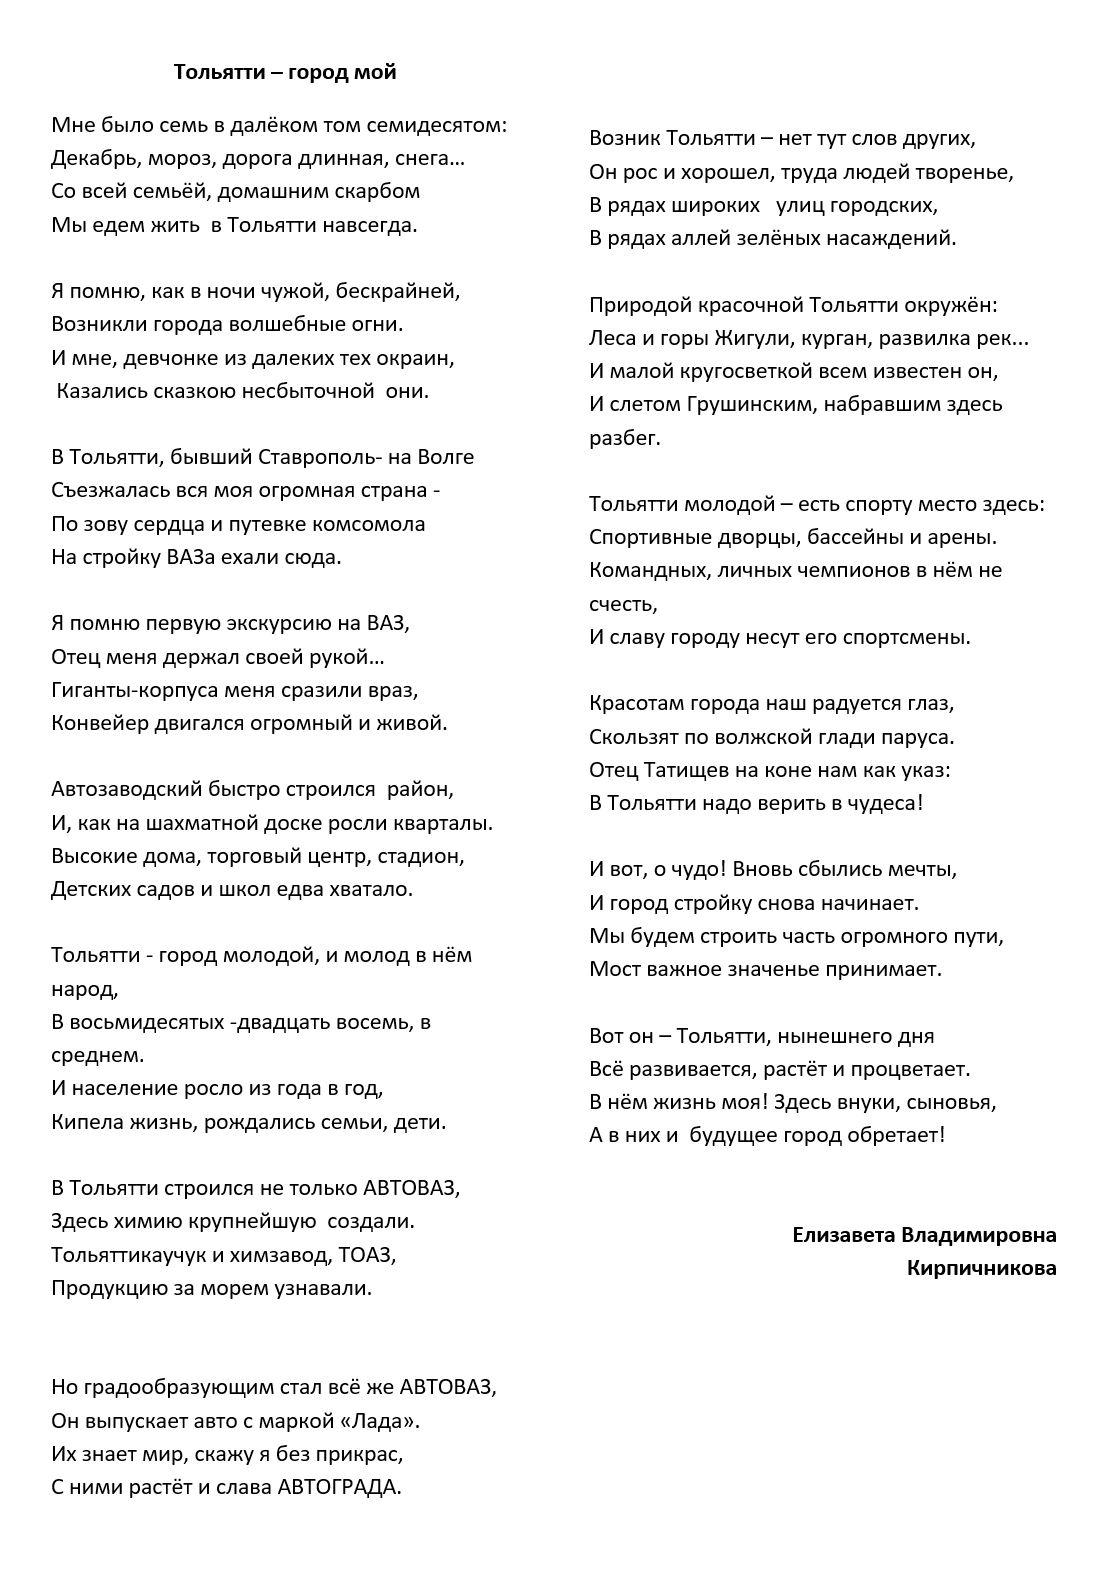 Кирпичникова Елизавета Владимировна